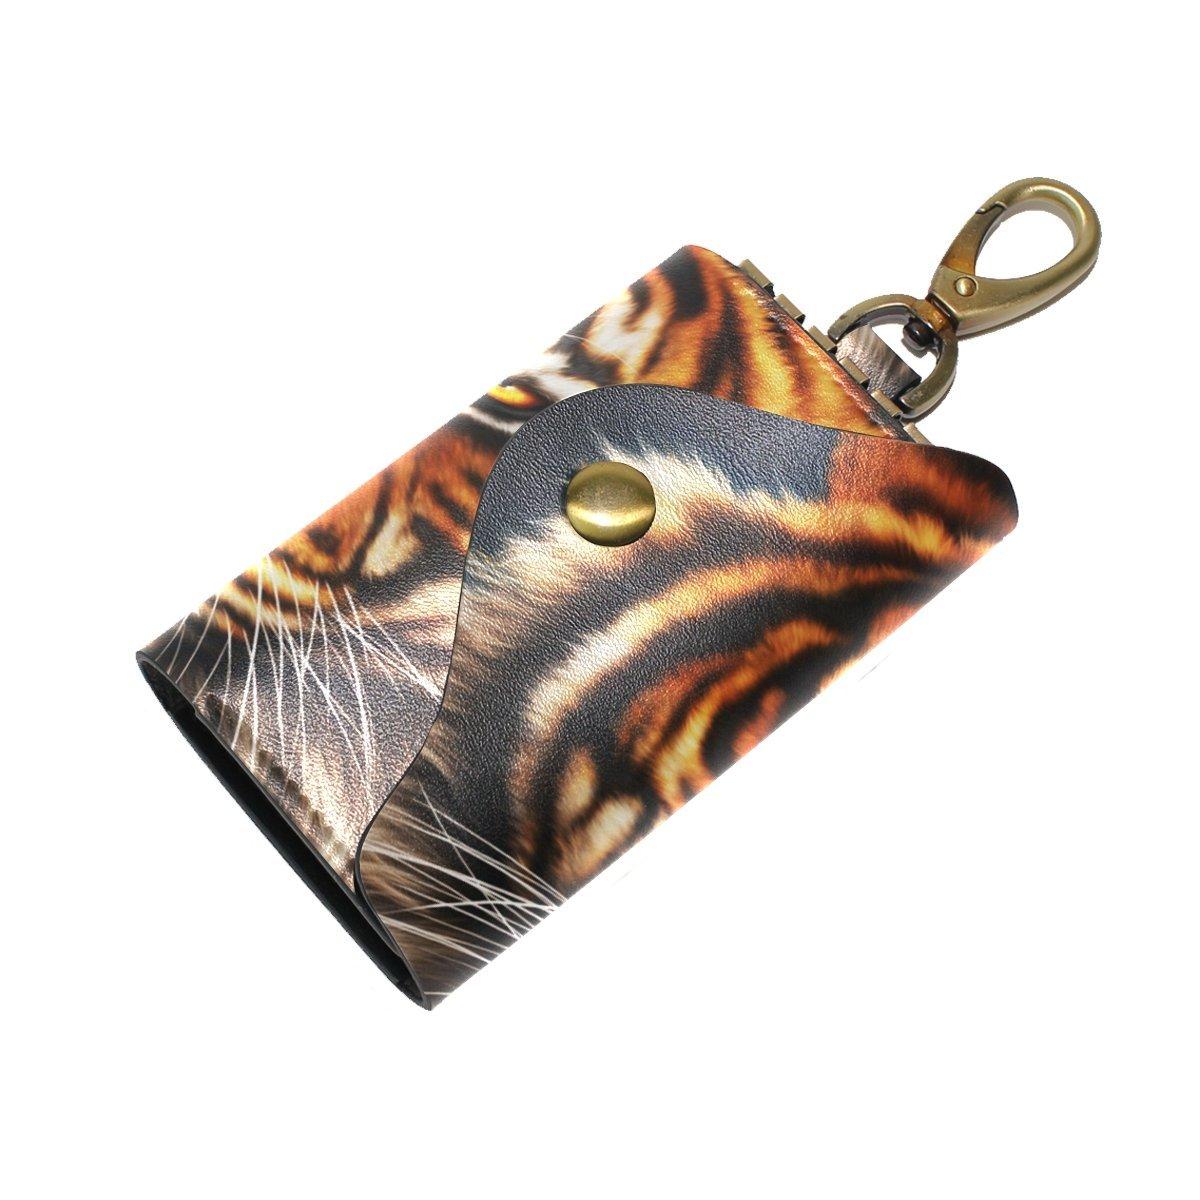 DEYYA Popular Tiger Face Leather Key Case Wallets Unisex Keychain Key Holder with 6 Hooks Snap Closure